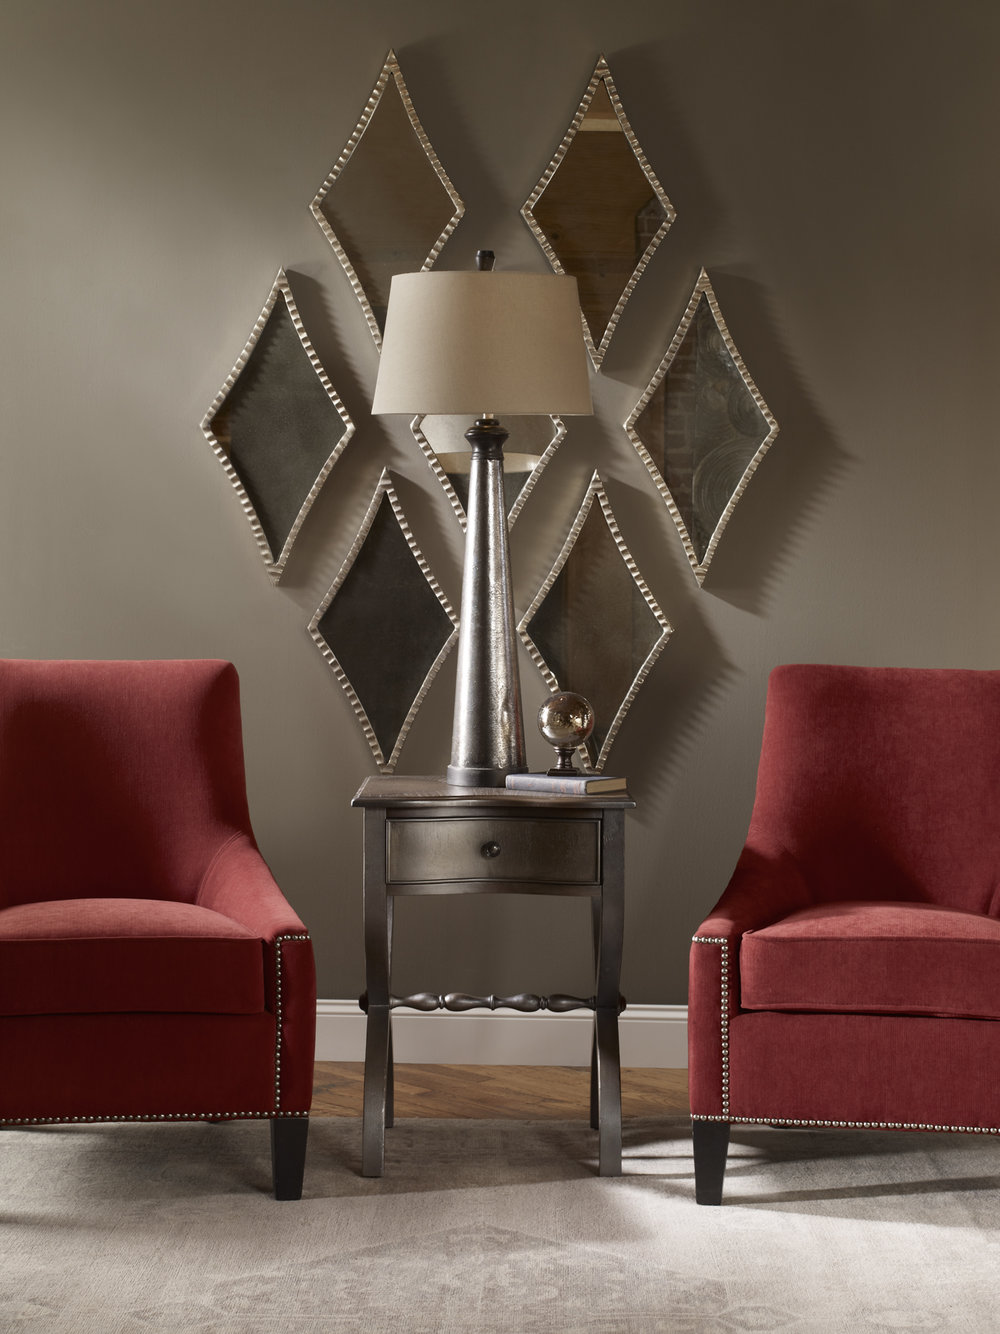 interior-design-temecula-coachella-palm-springs-california